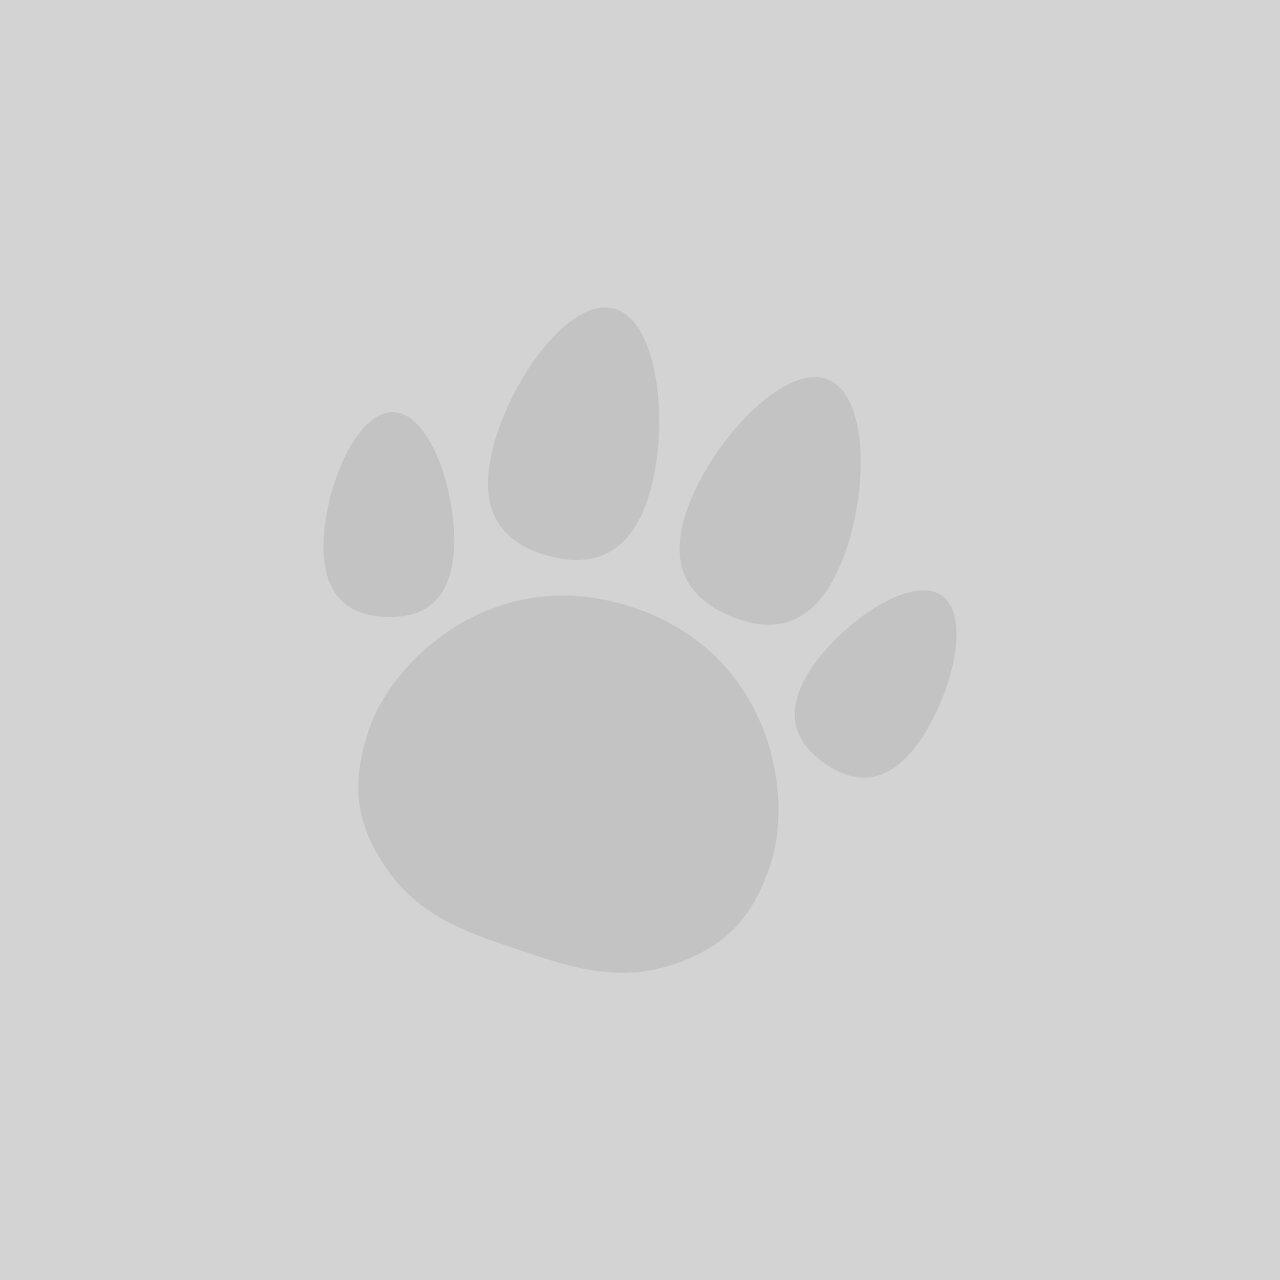 Ancol Nylon Padded Dog Lead 1.8mx25mm (3 Colour Options)